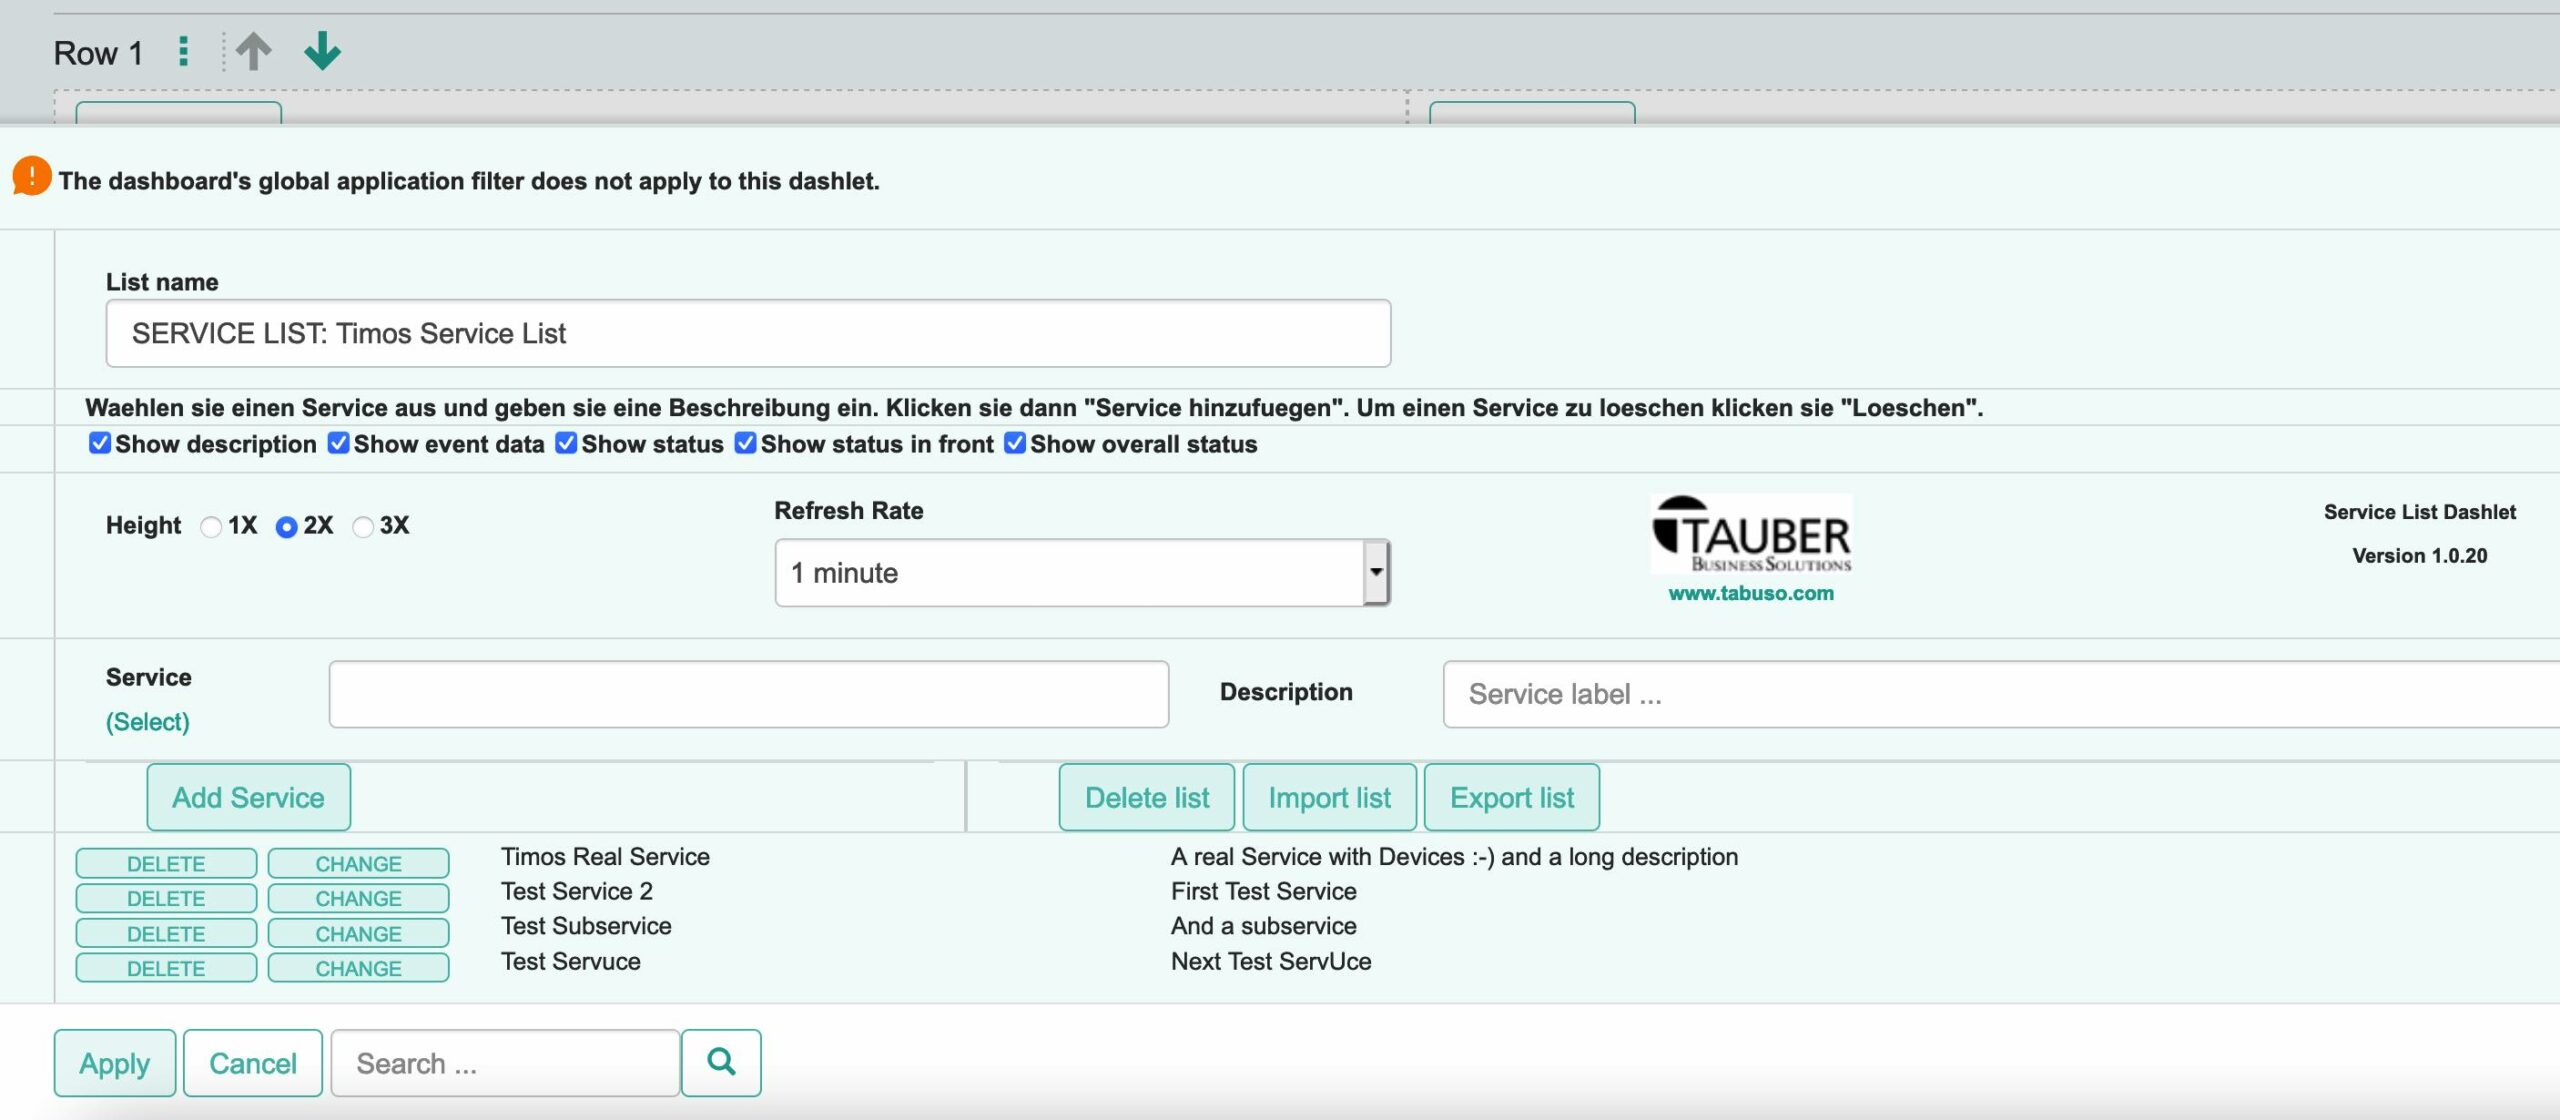 TAUBER Service List Dashlet / Configuration View